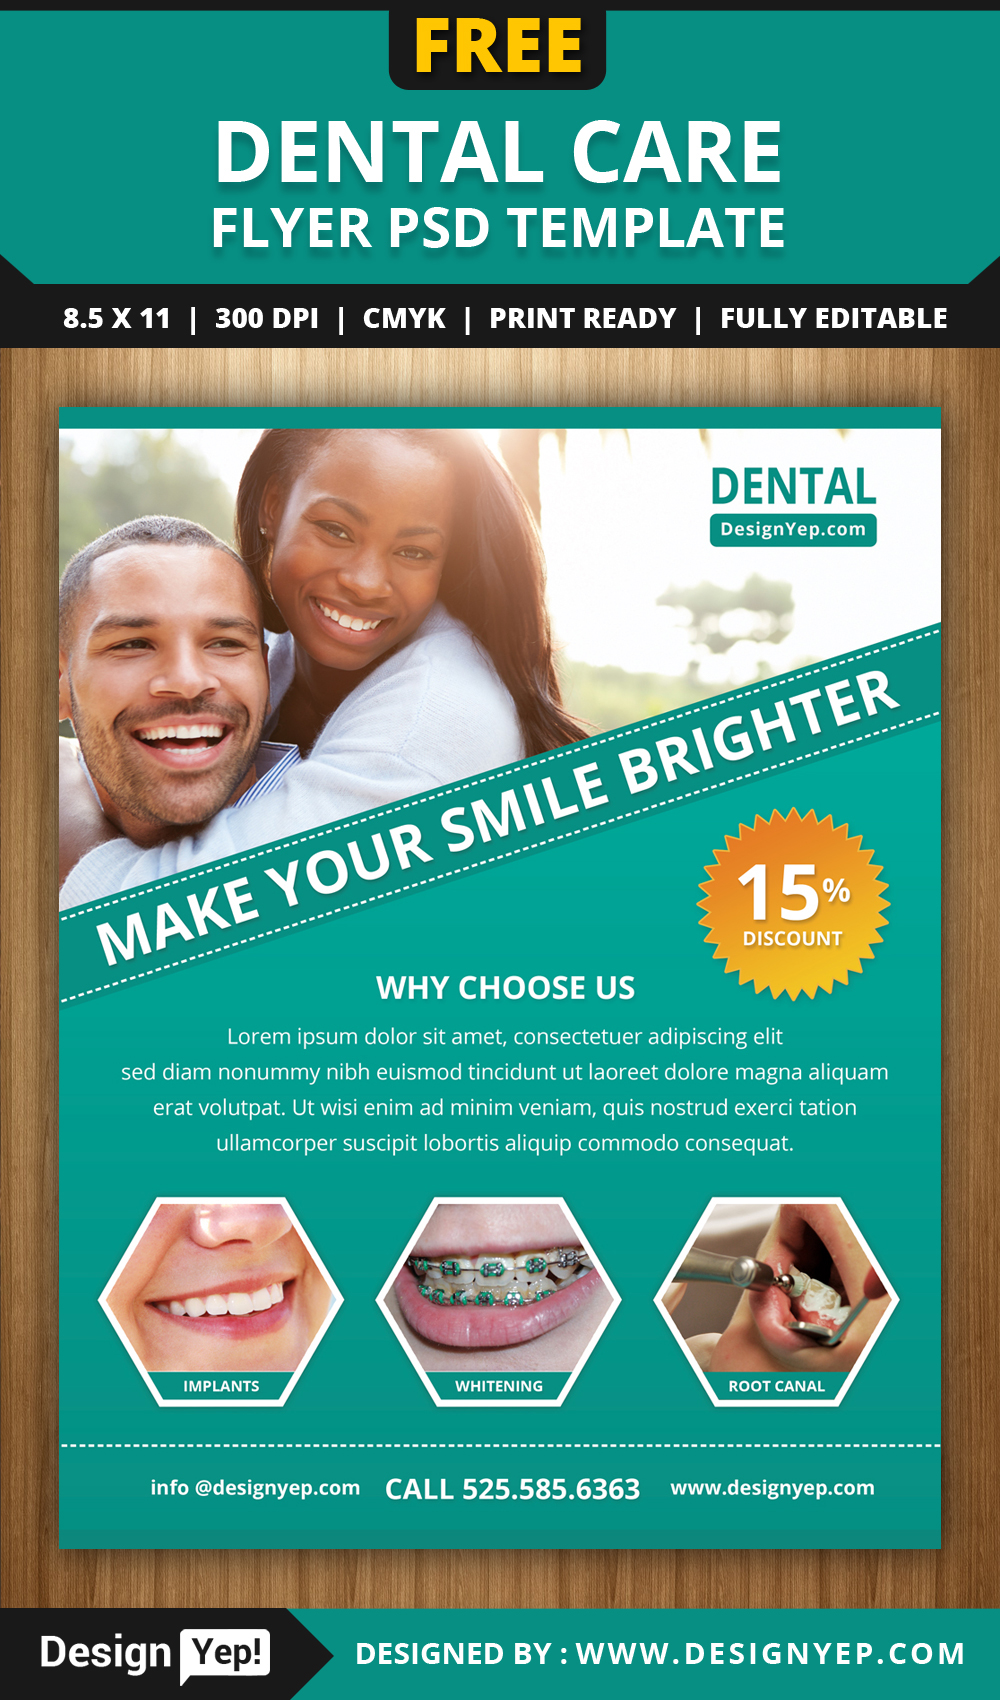 free dental care flyer psd template on behance